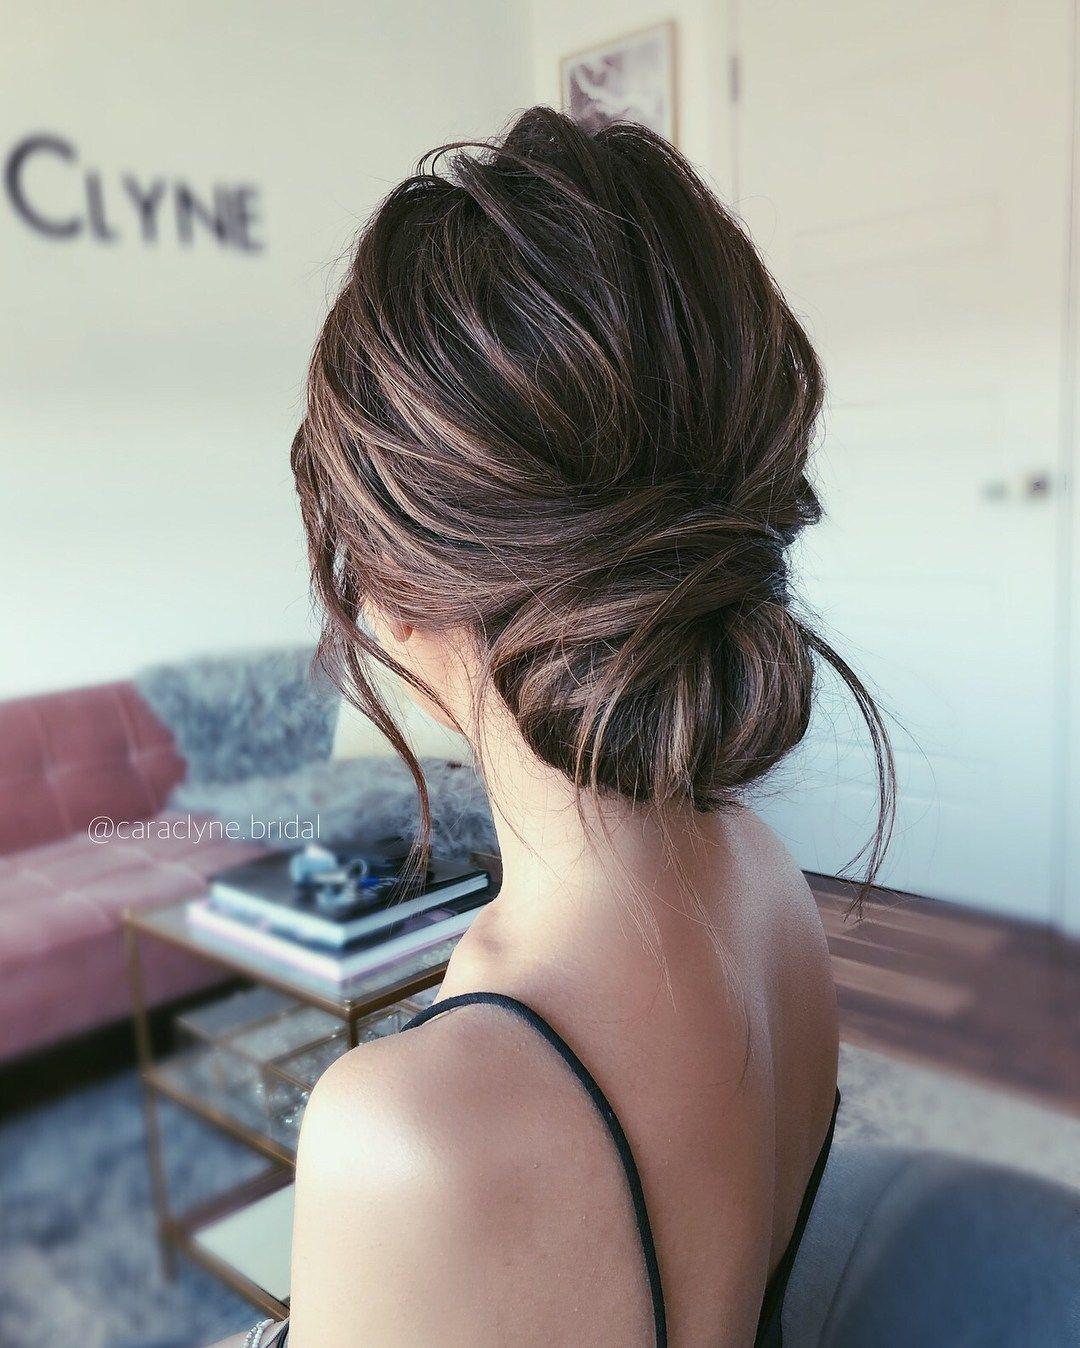 Fabulous Twisted updo hairstyle  - wedding updo #hairstyle #hair #updo #weddinghairstyles